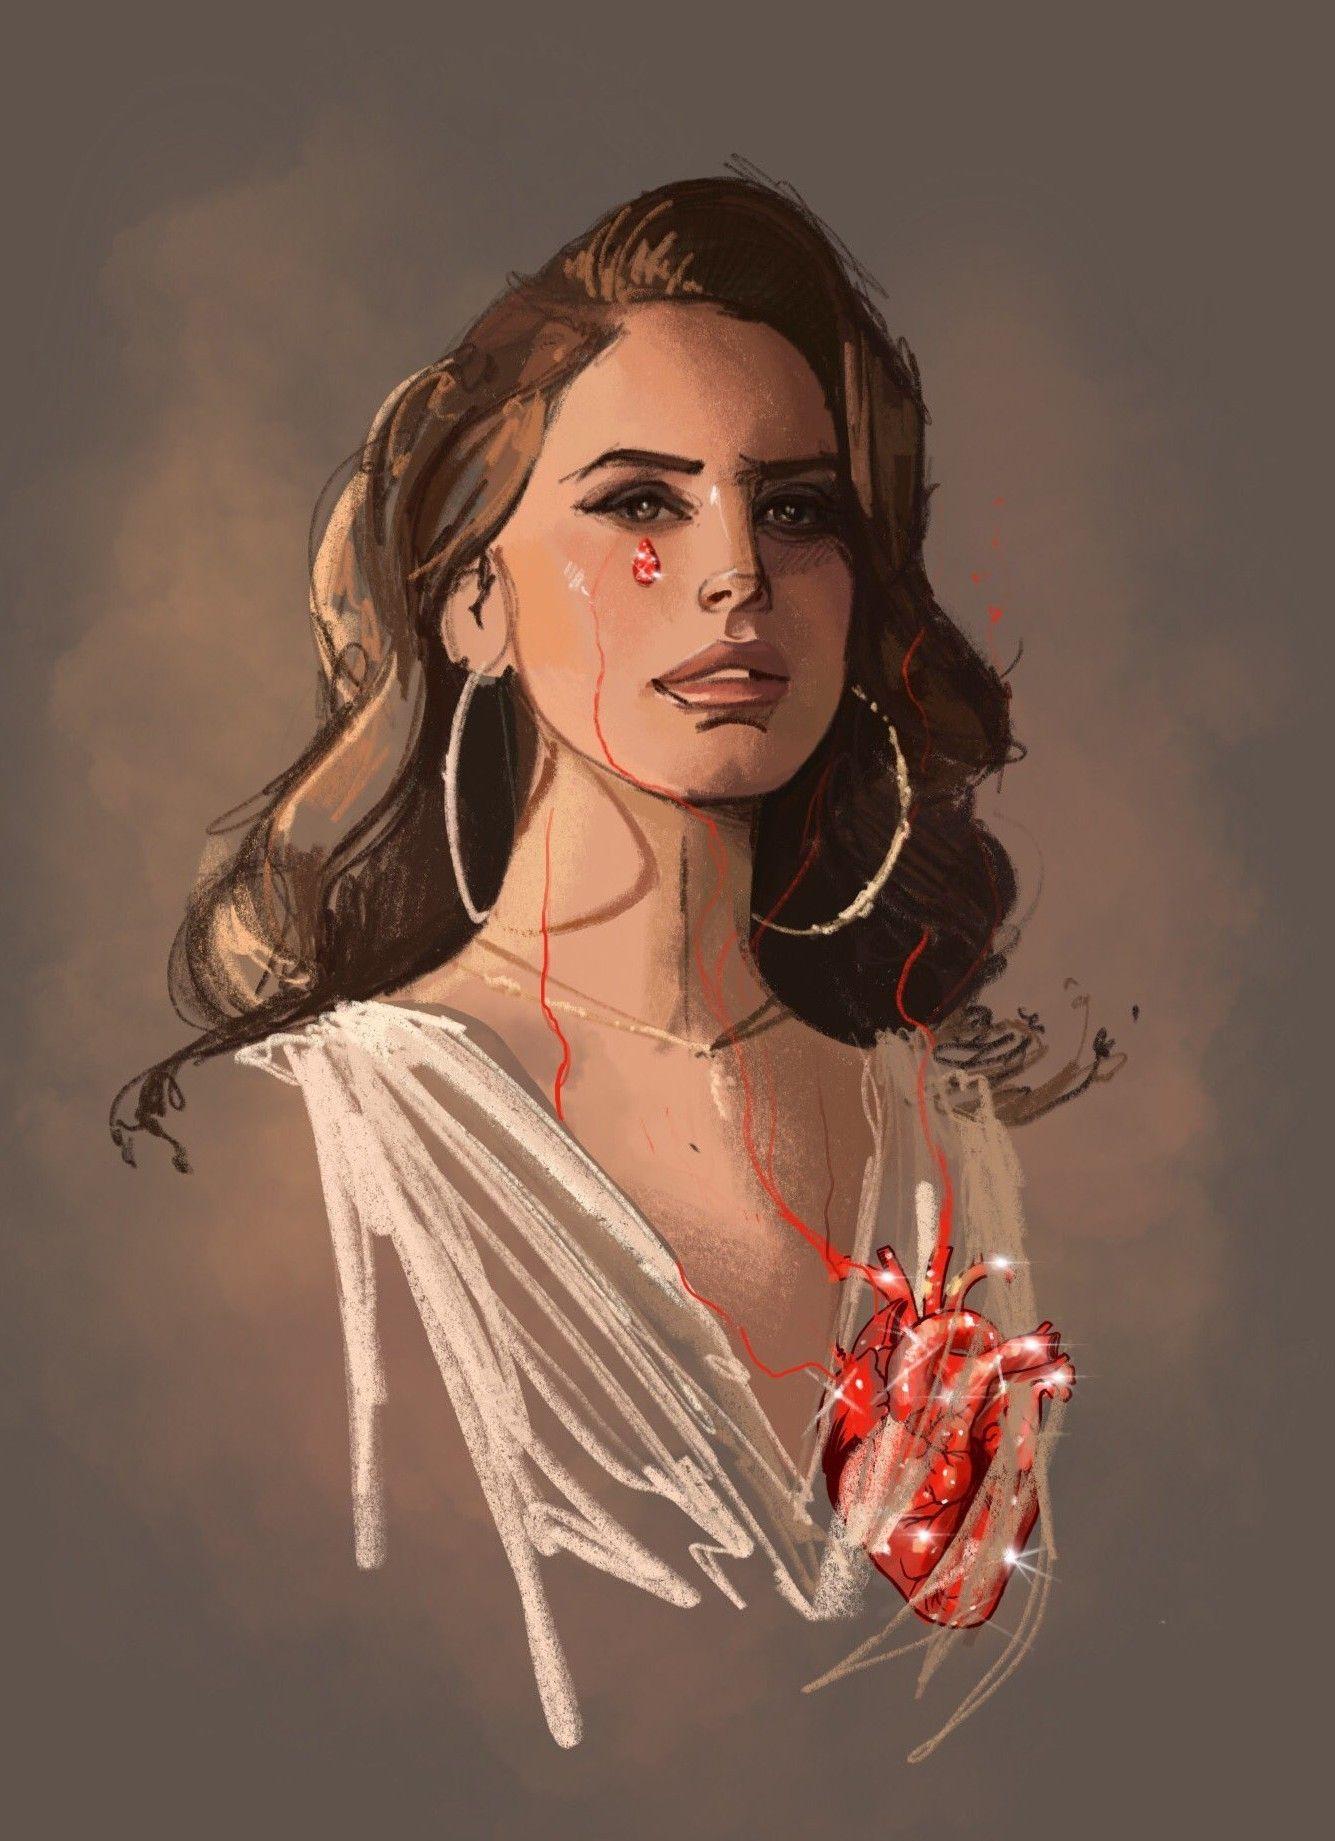 e5a535ff4ba3 Lana Del Rey #art by Fernando Monroy | Lana Del Rey in 2019 | Lana ...